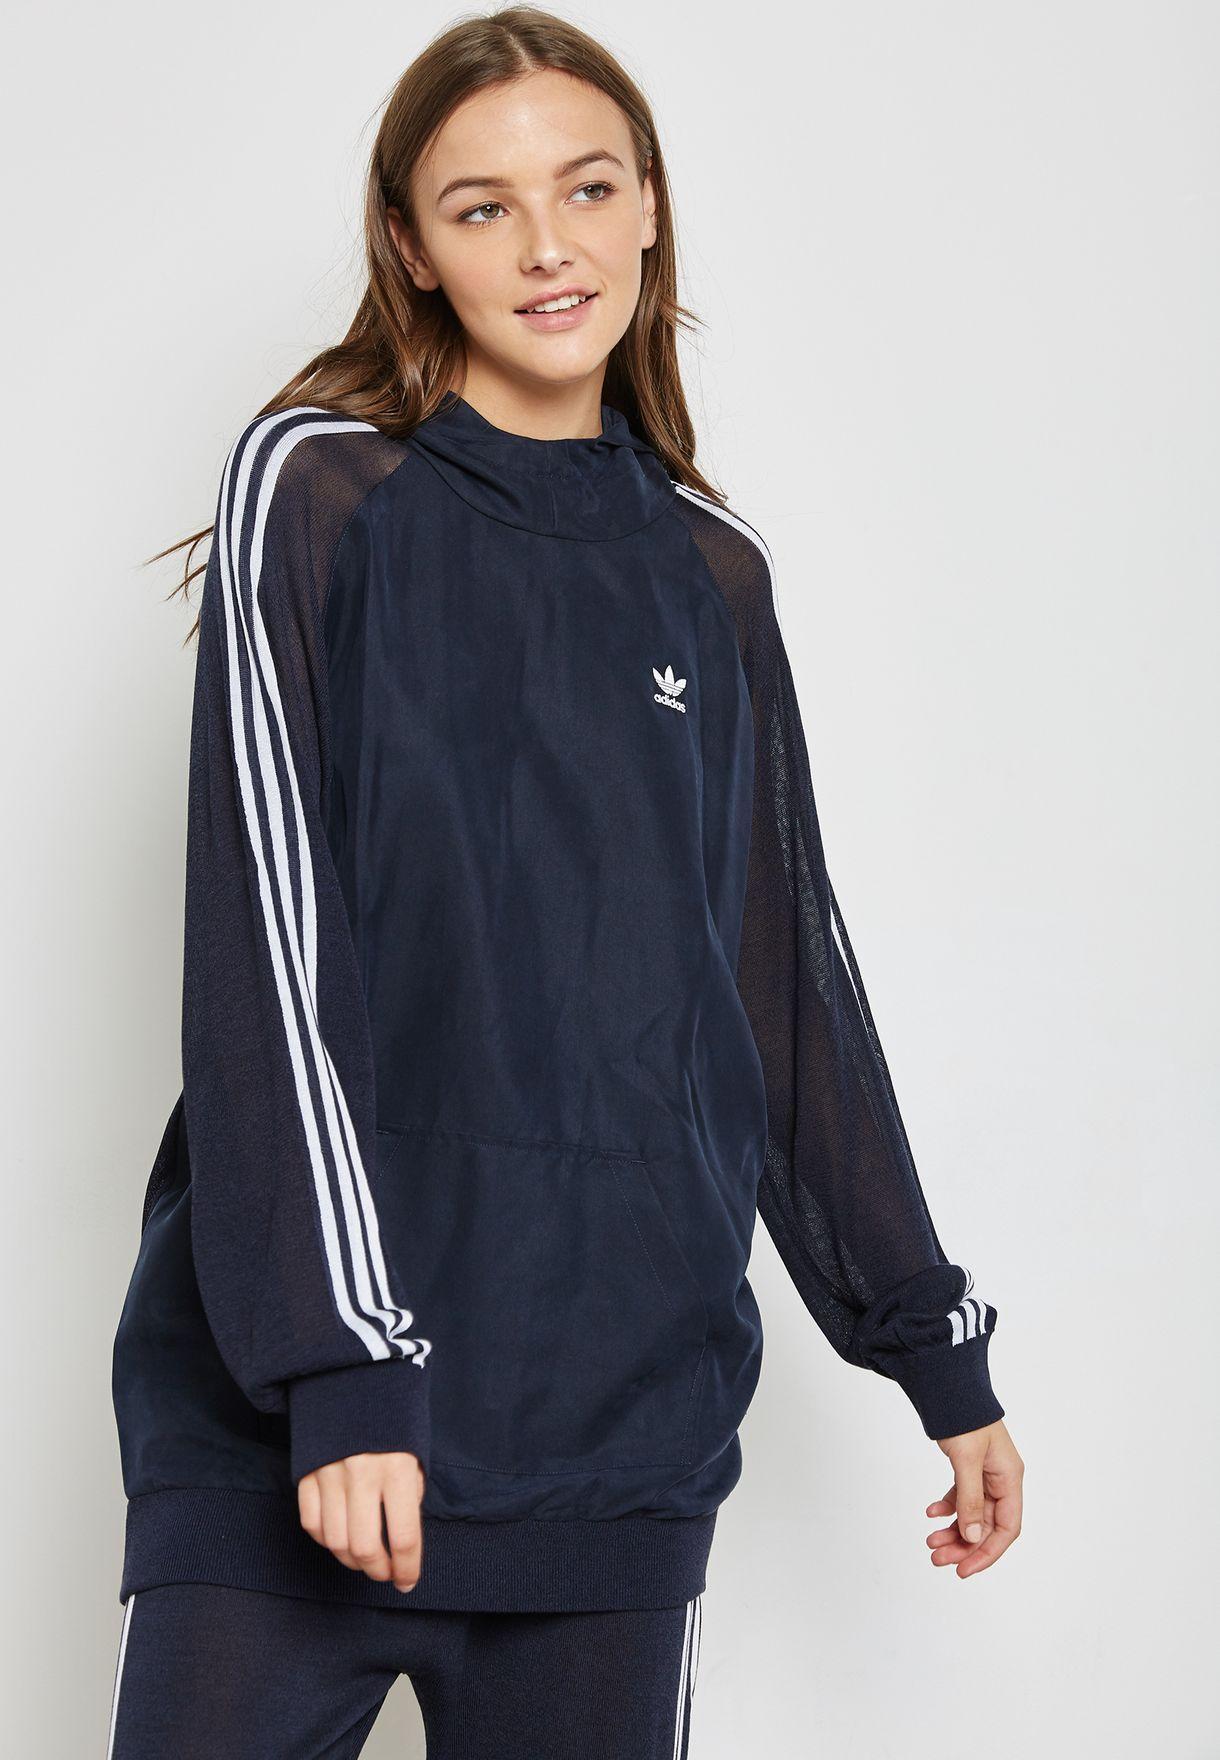 adidas hoodie 3 stripes